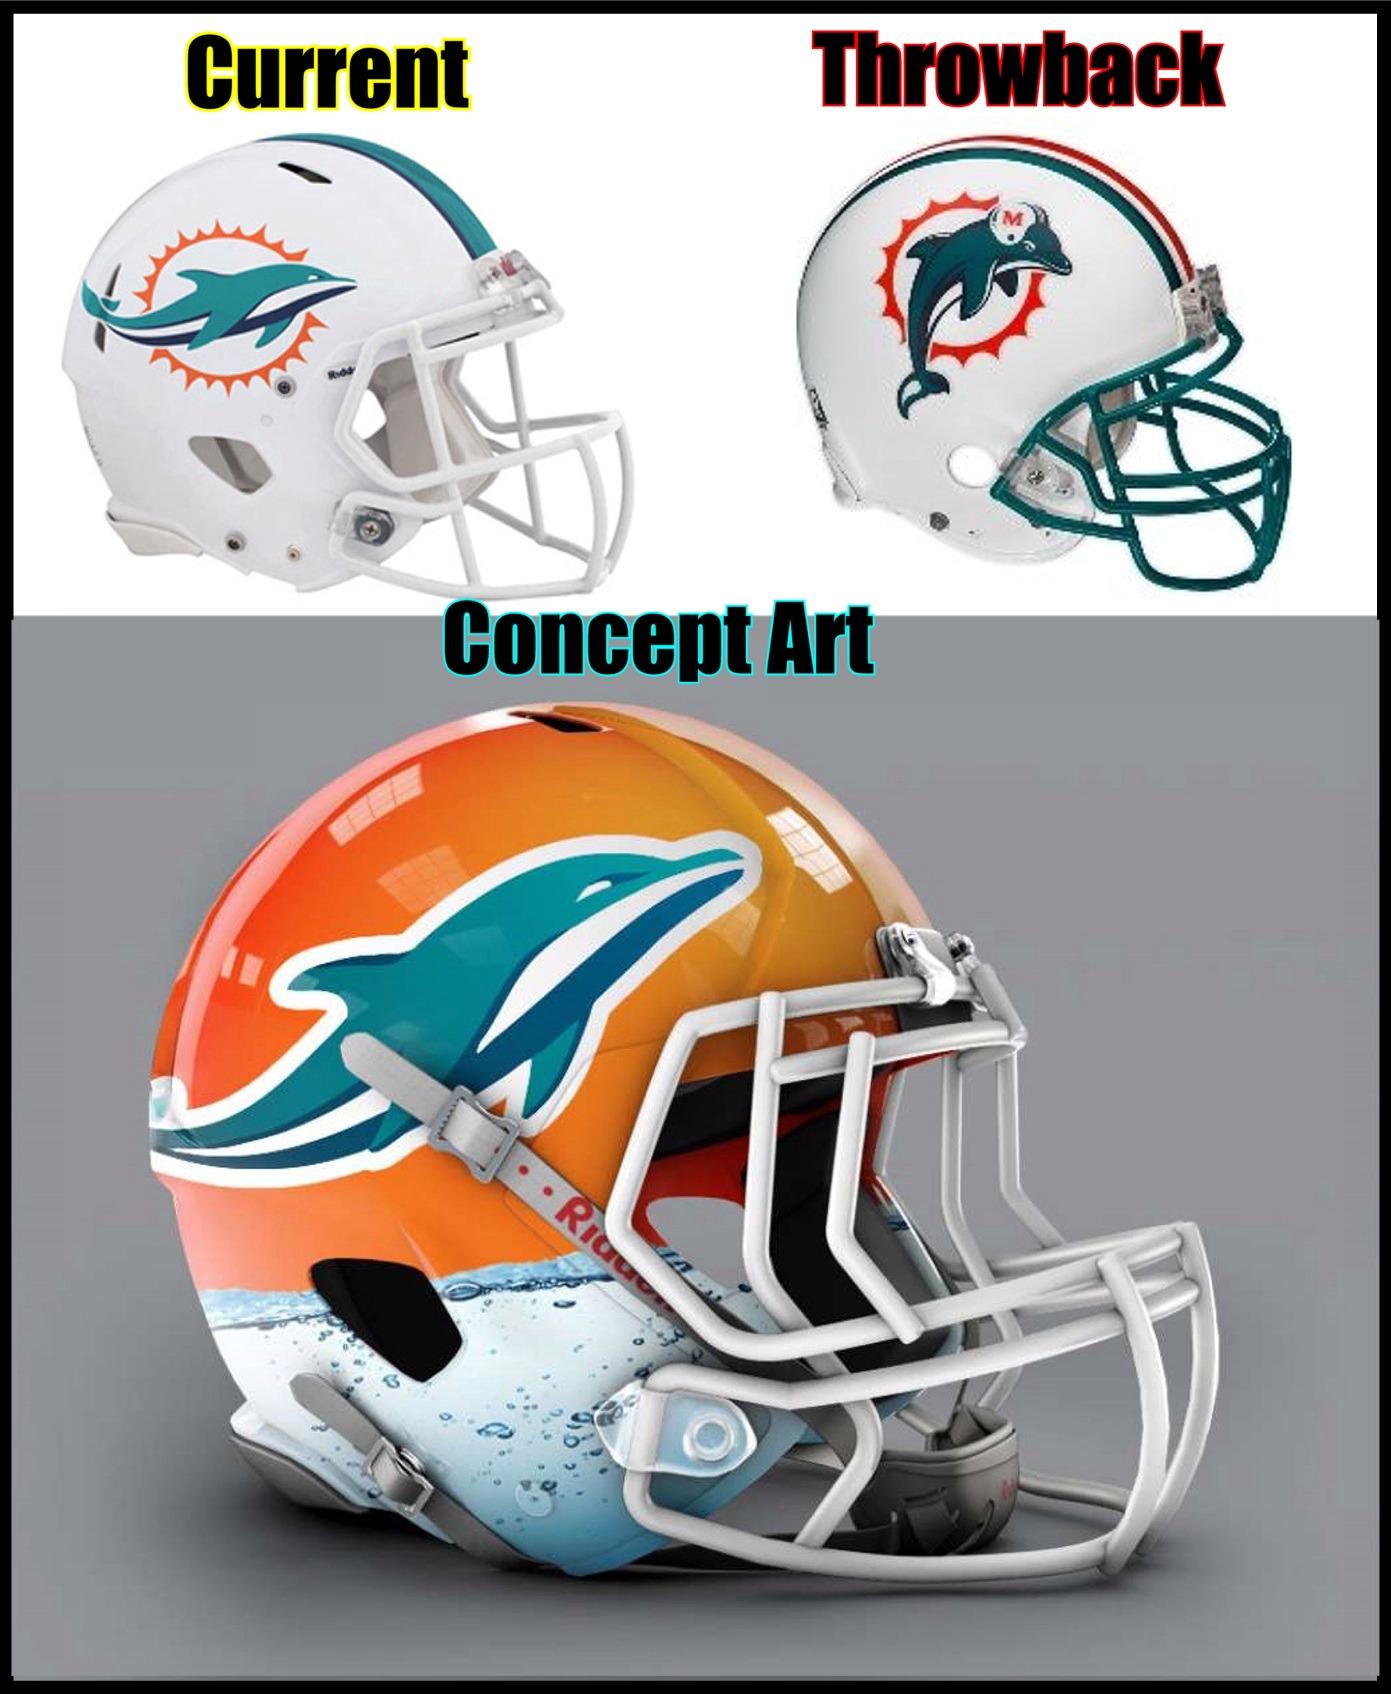 nfl concept helmet designs by paul bunyan ftw gallery